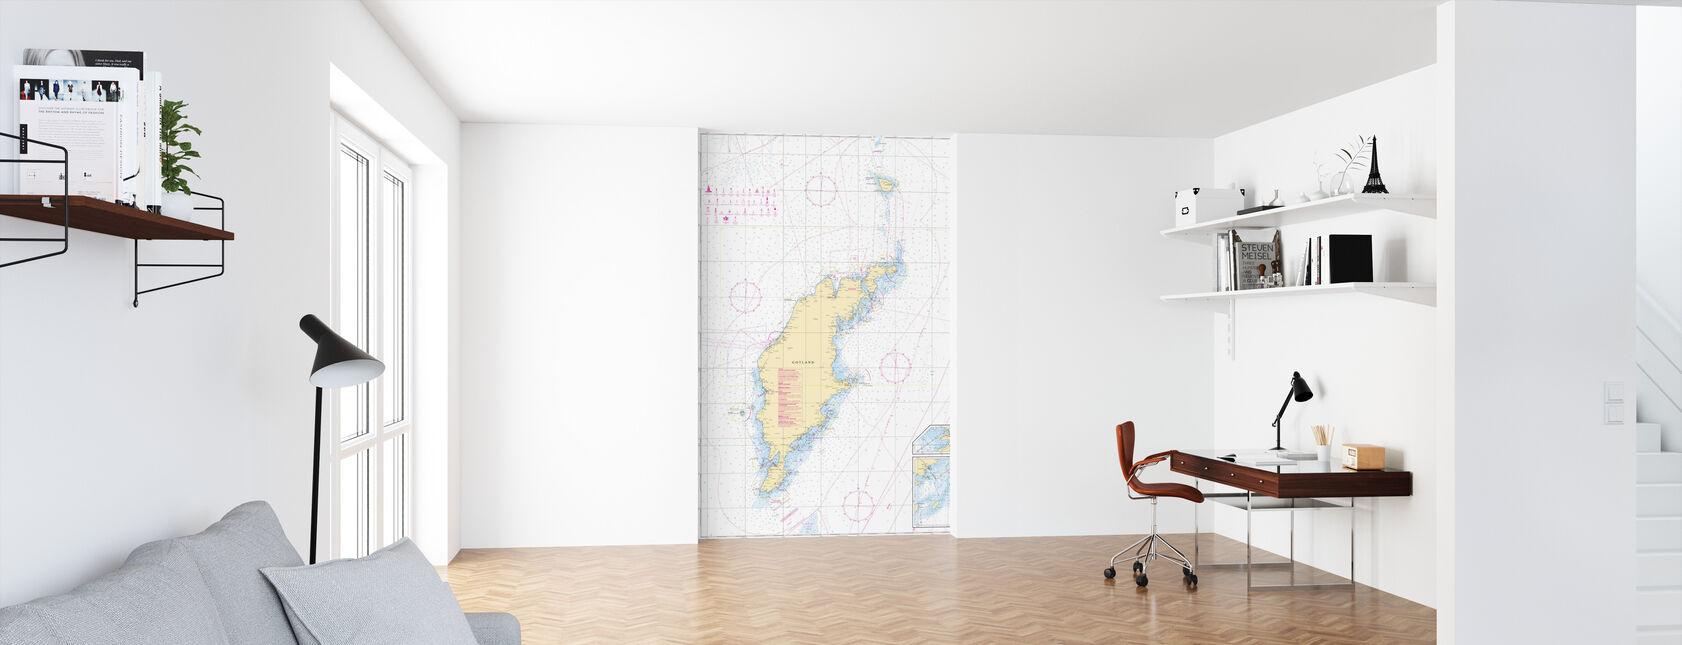 Sea Chart 73 - Gotland - Wallpaper - Office